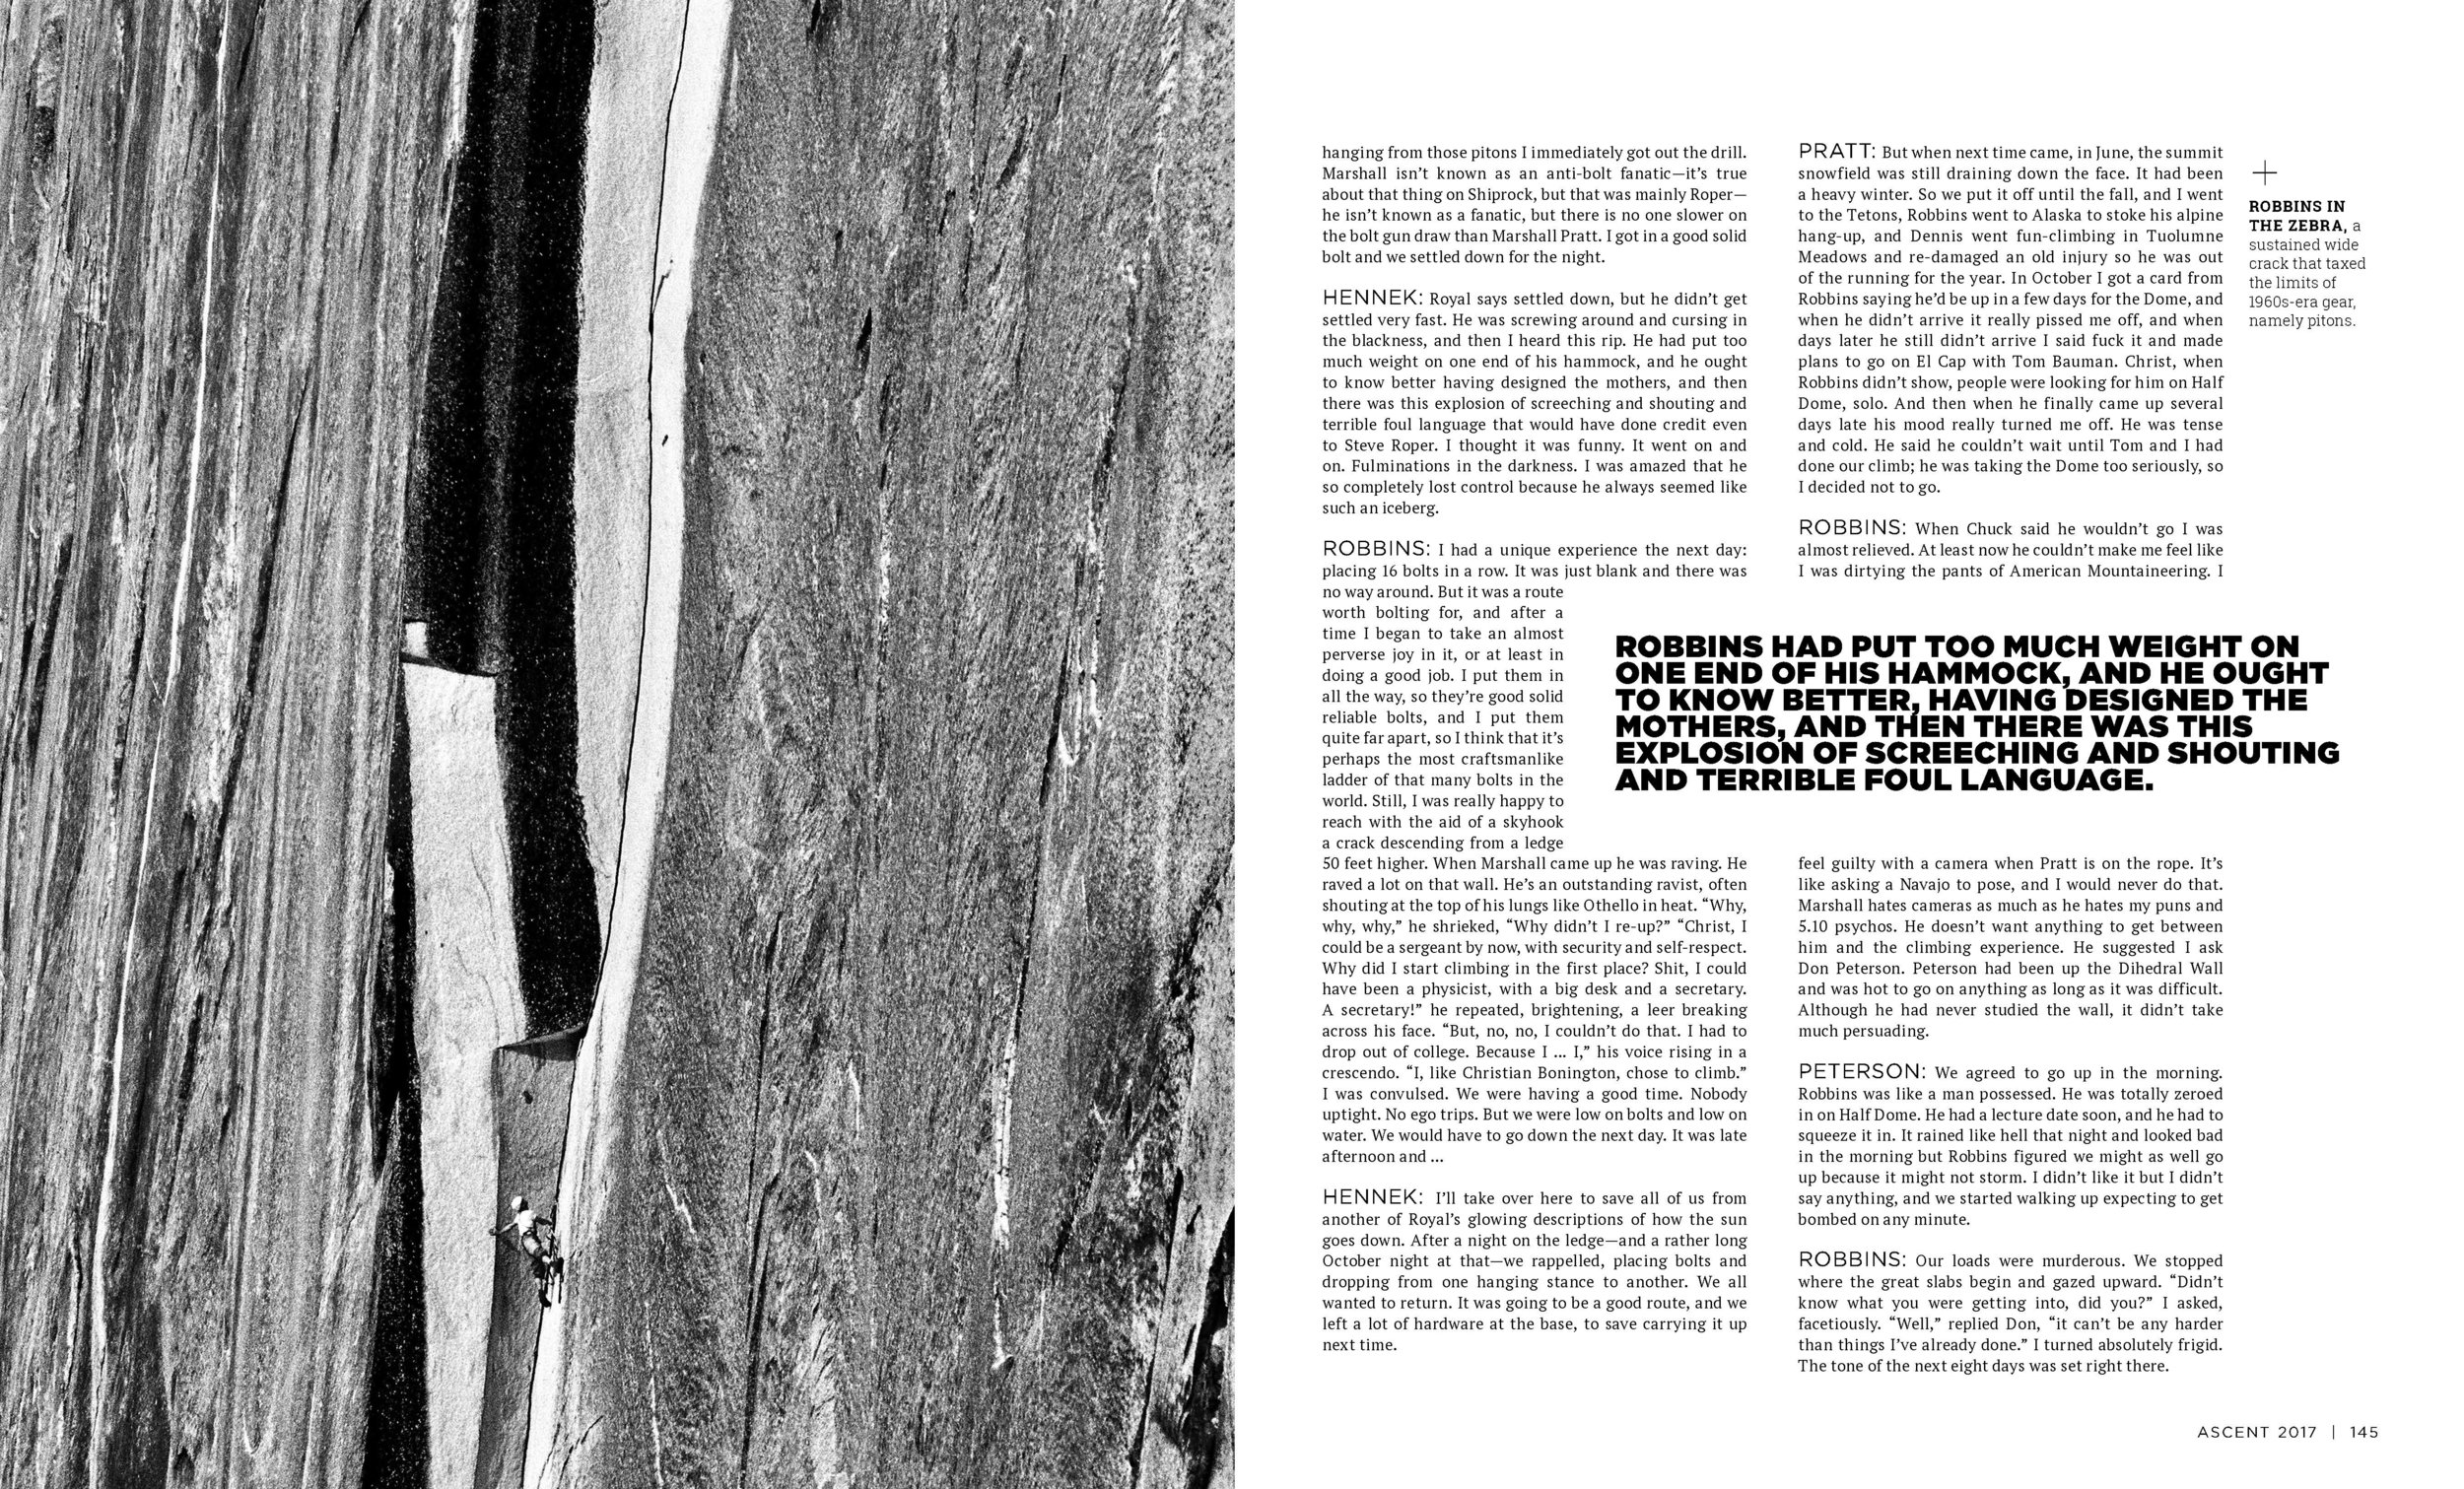 p.144-145 Tis-sa-ack 242.jpg